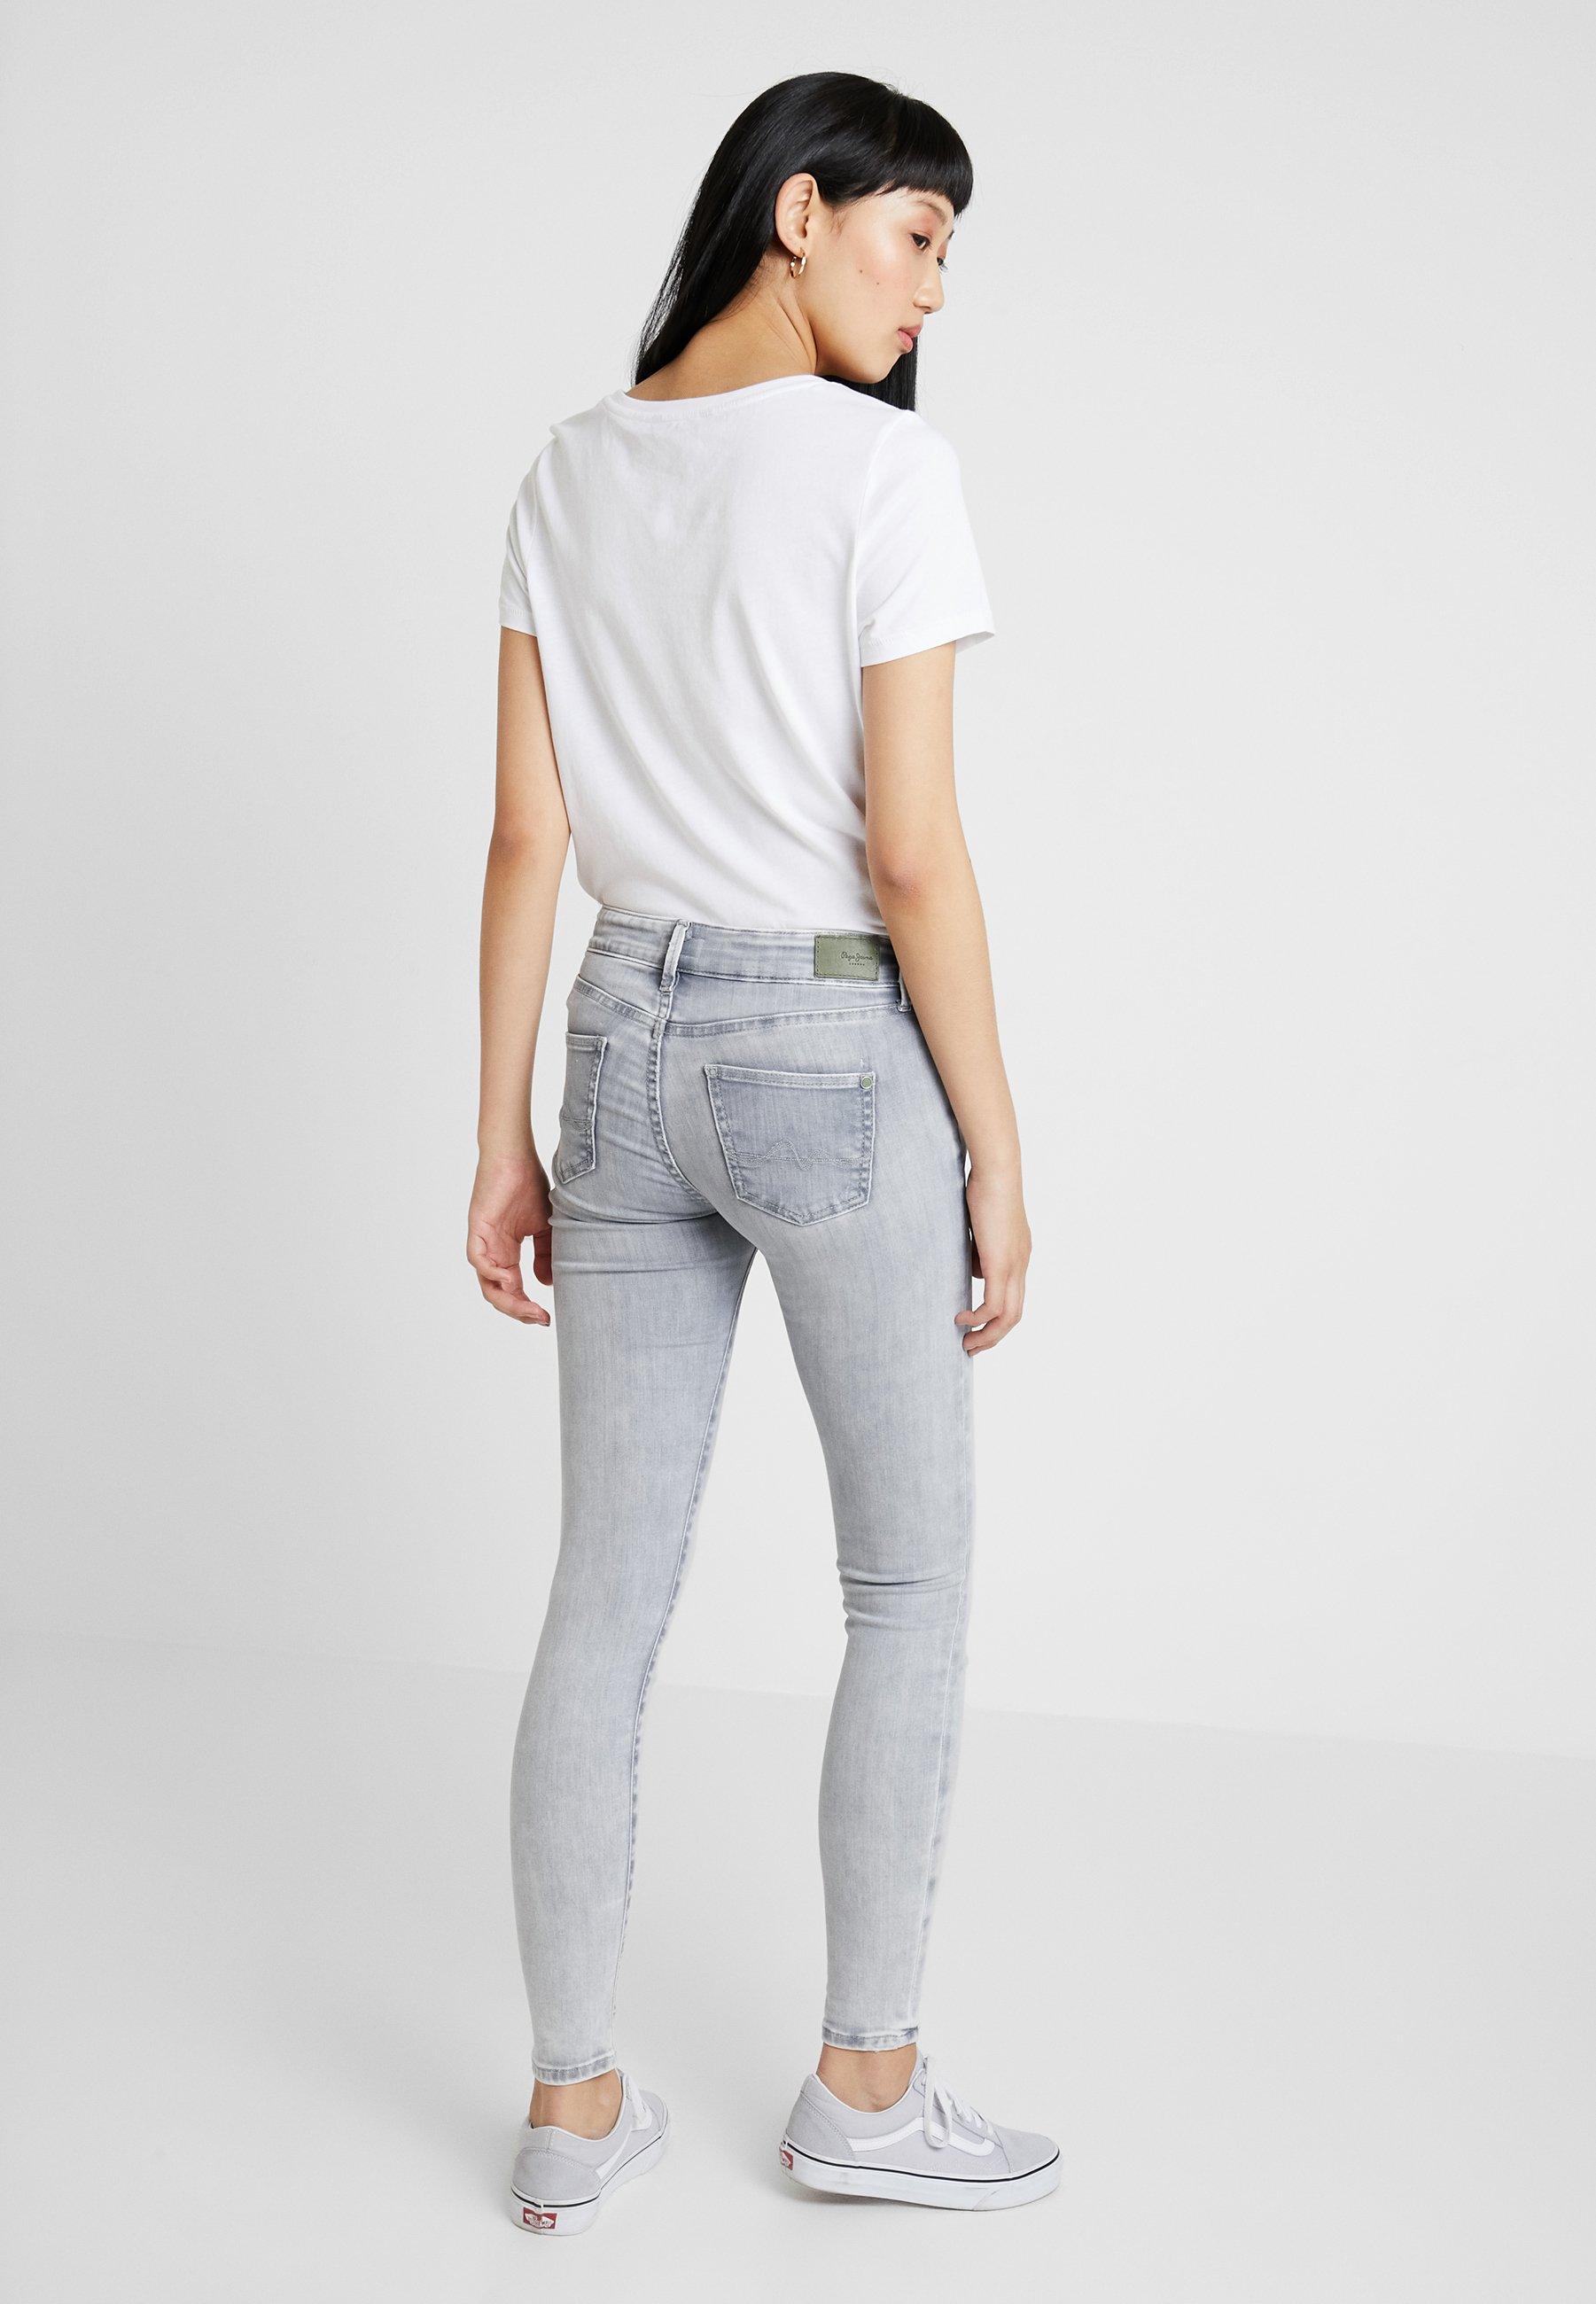 PixieSkinny Denim Wiser Grey Pepe Wash Jeans Destroy mNPy8wvn0O